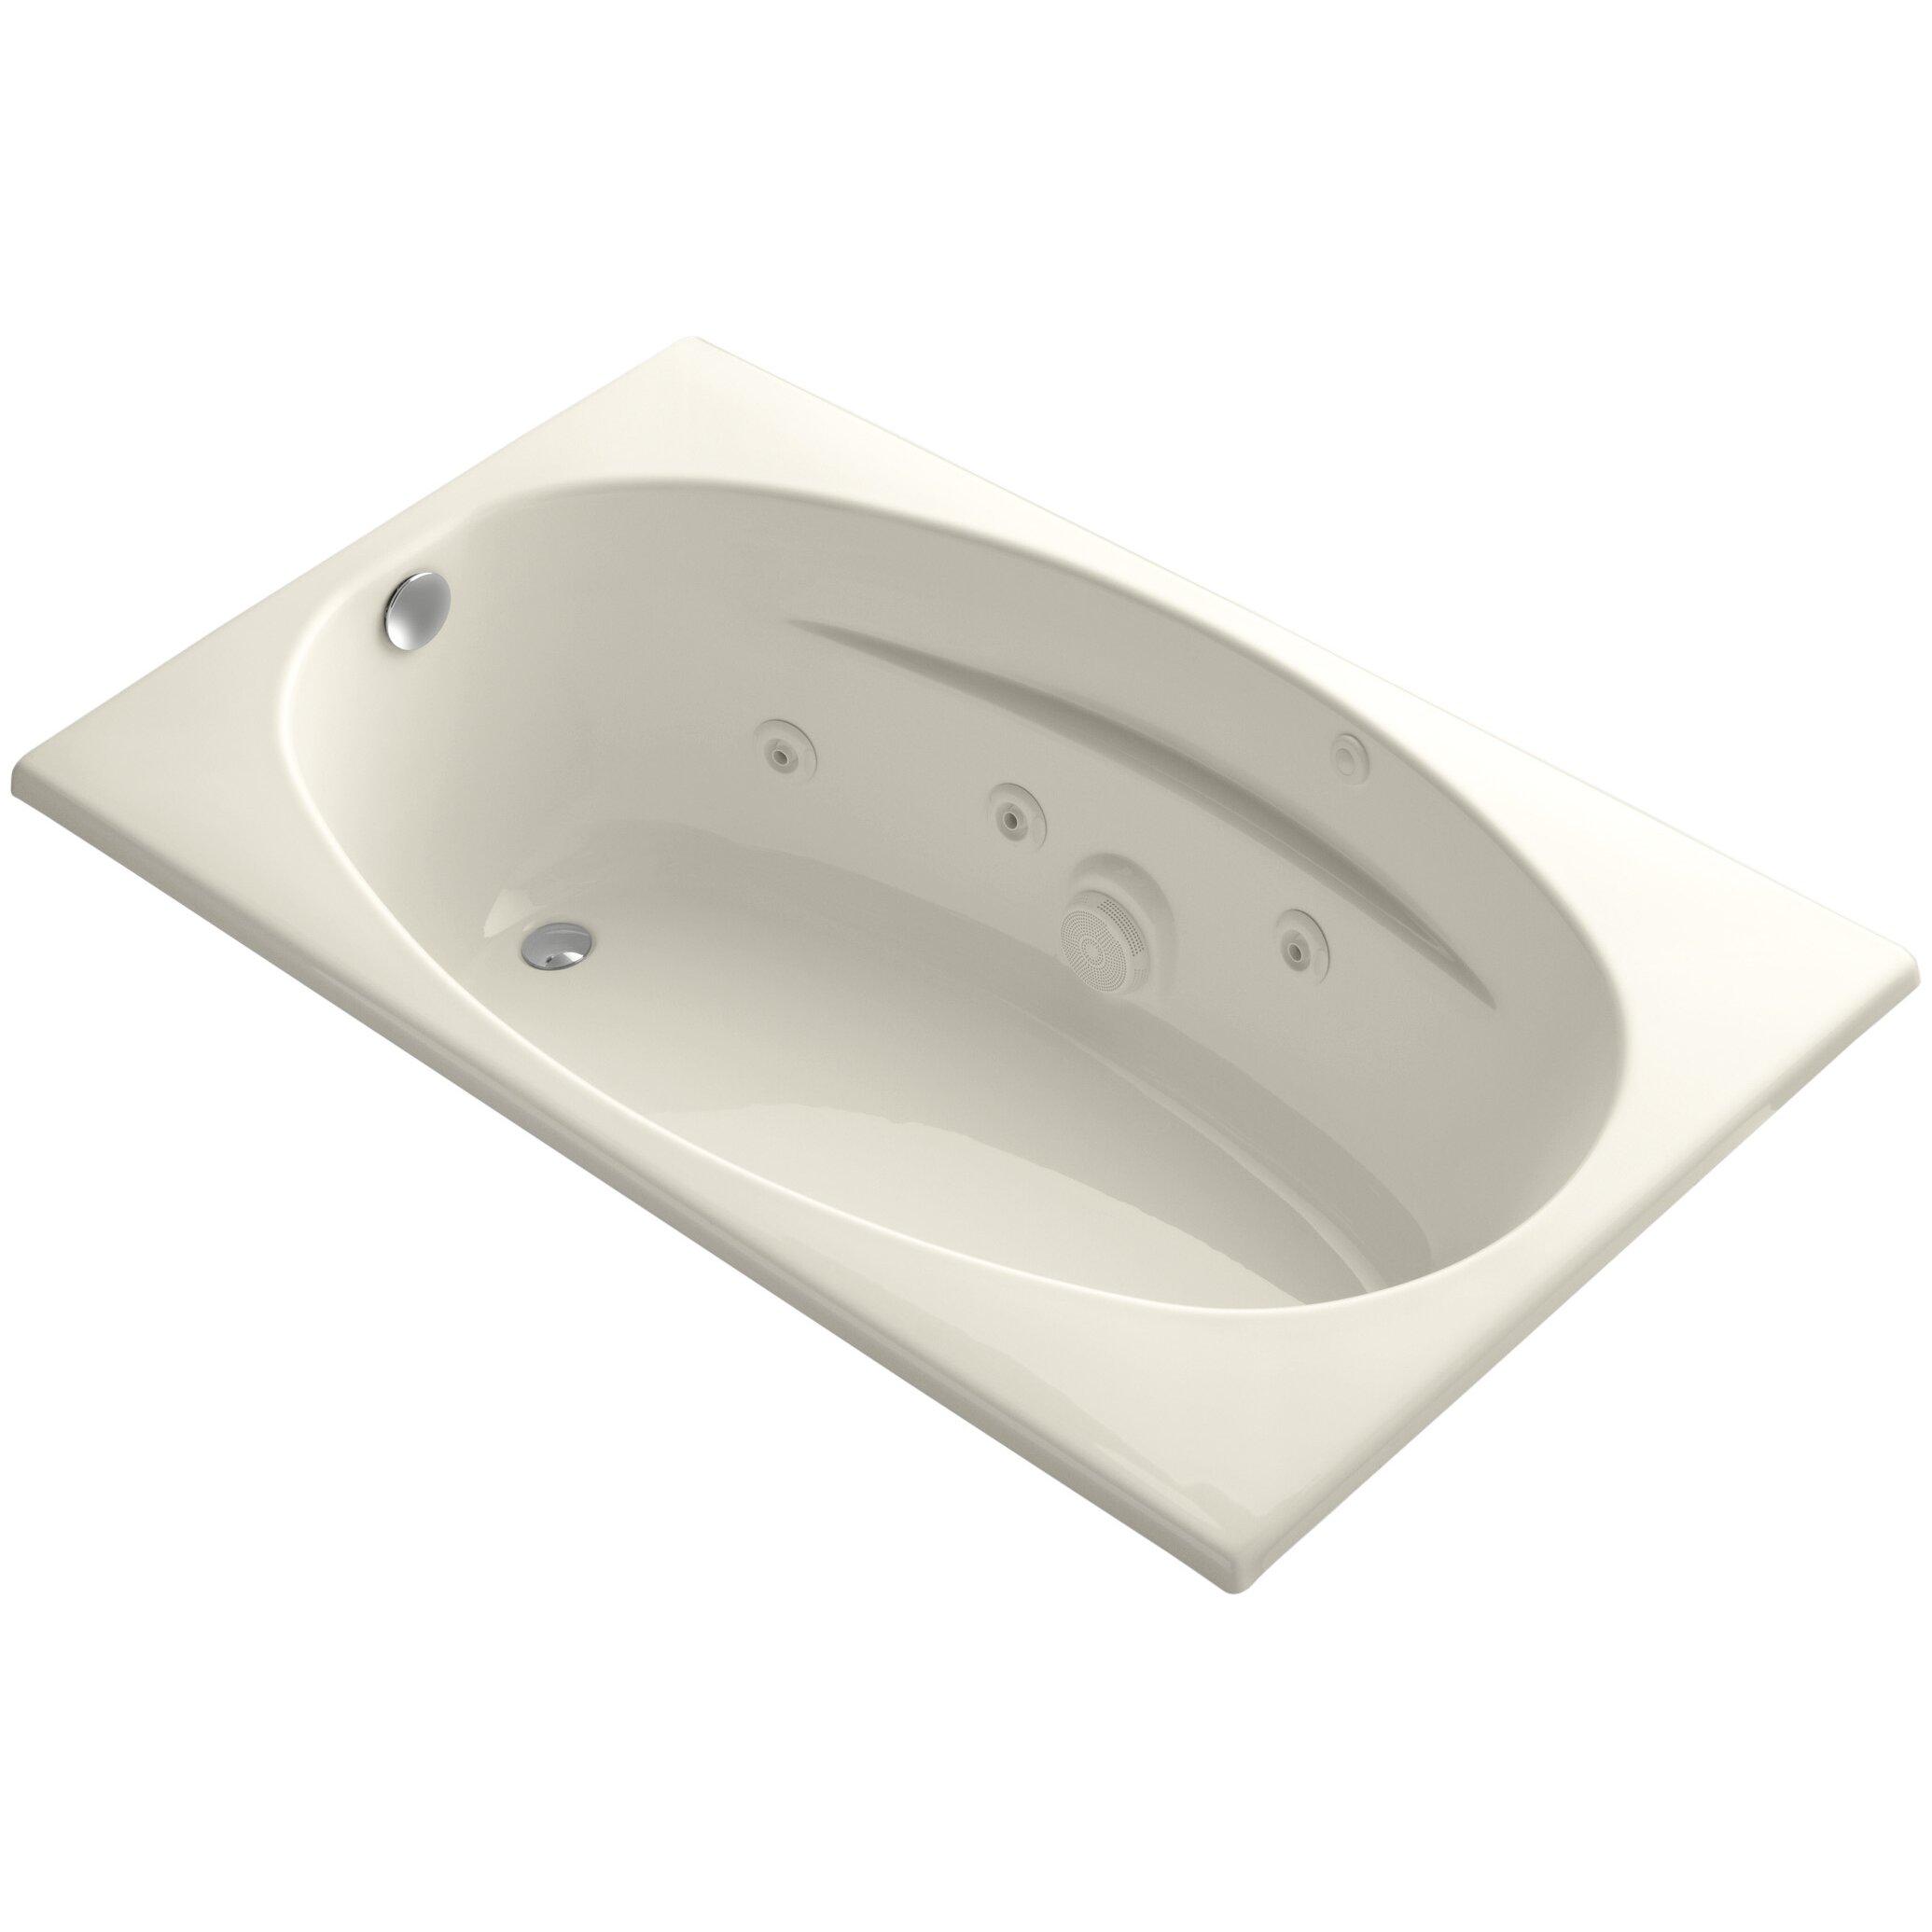 Bathtubs 60 X 36 28 Images Kohler 60 Quot X 36 Quot Whirpool Bathtub Wayfair Ca Carver Tubs